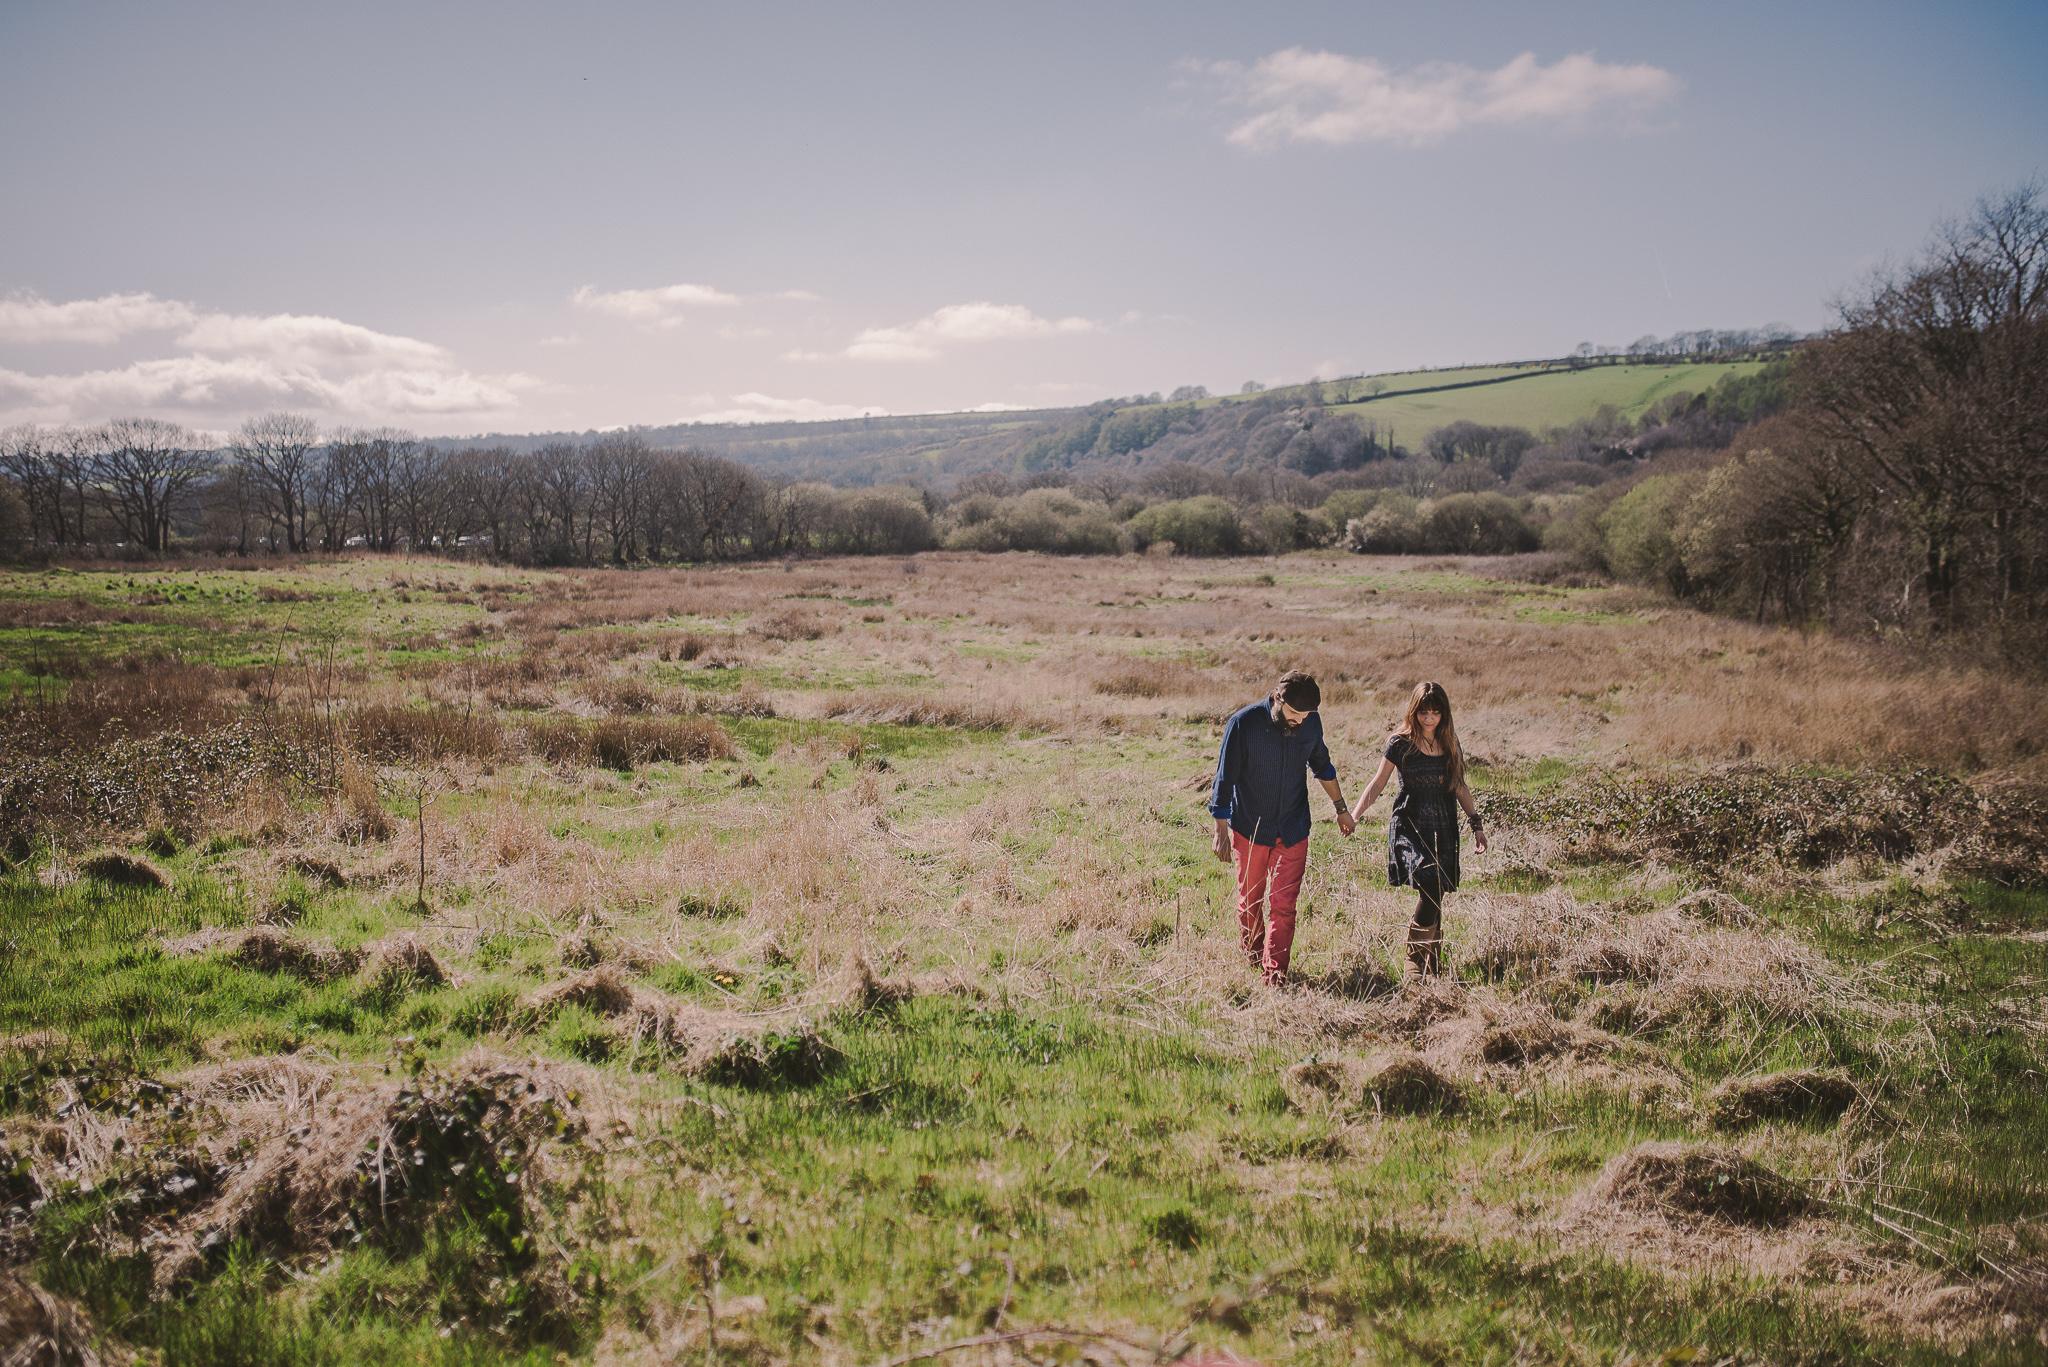 Rochan + Xexo - Snap Photo Festival - Wales-3-2.jpg